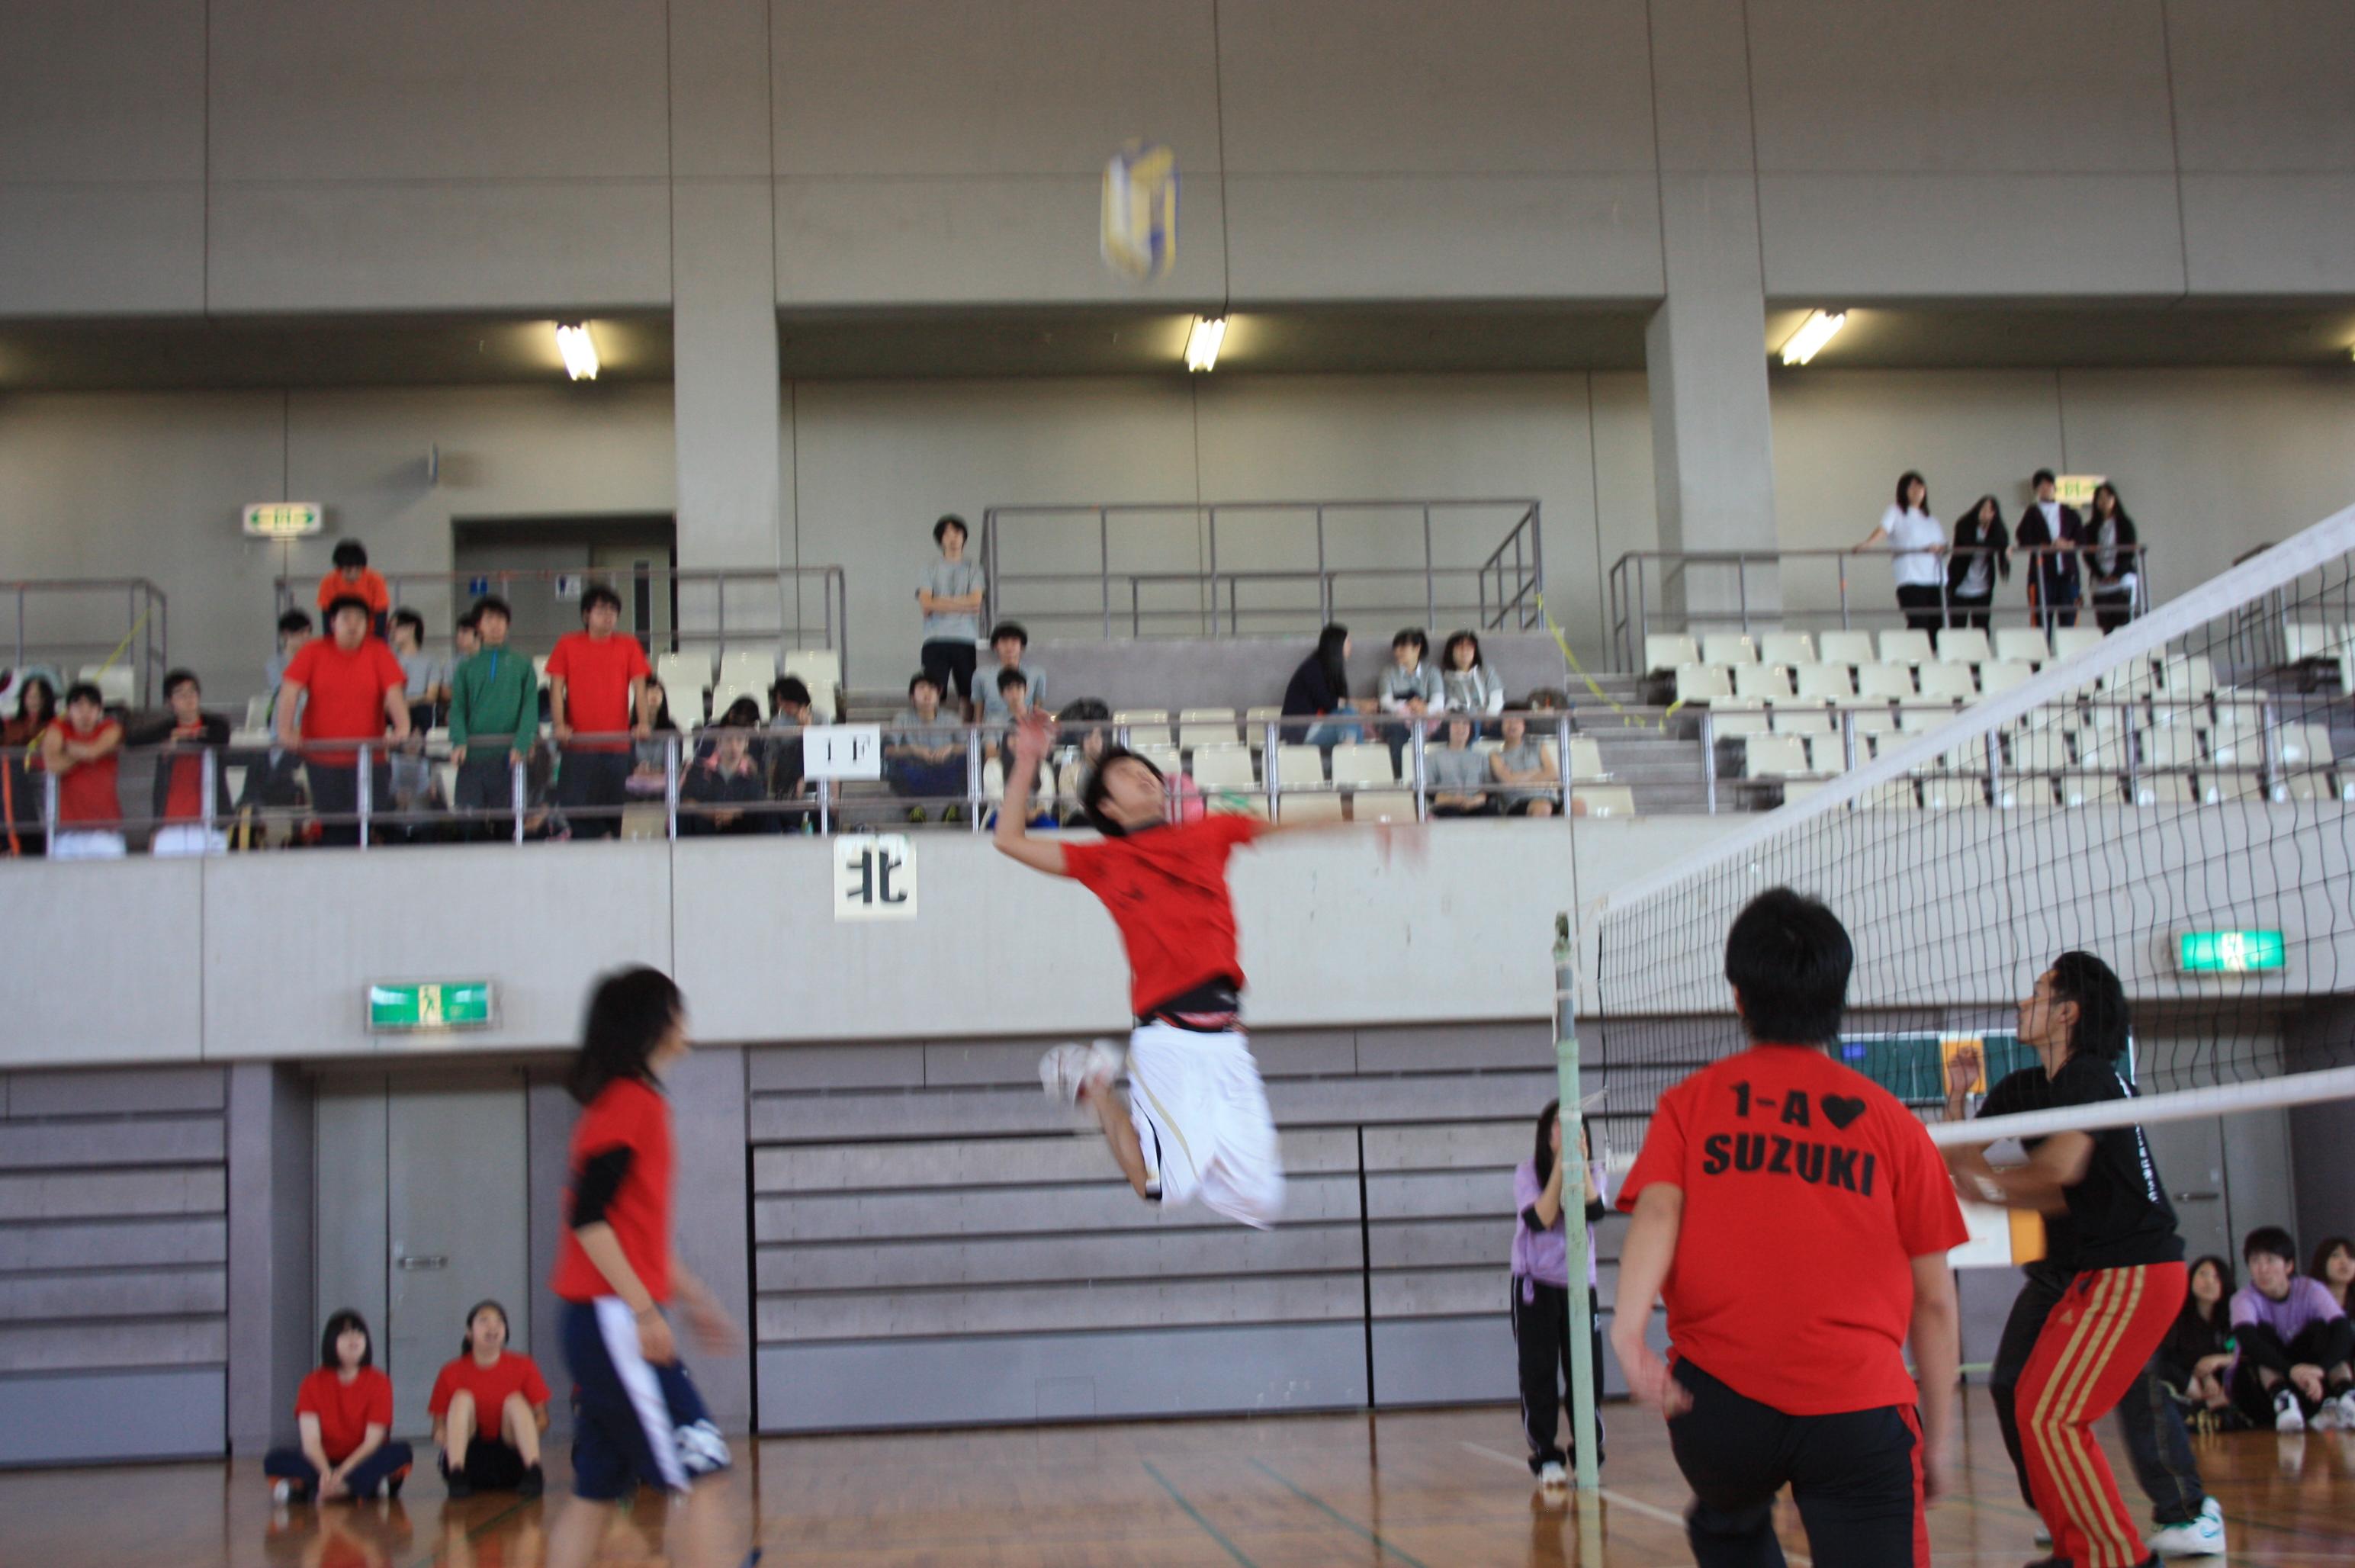 20121029-IMG_3756.JPG